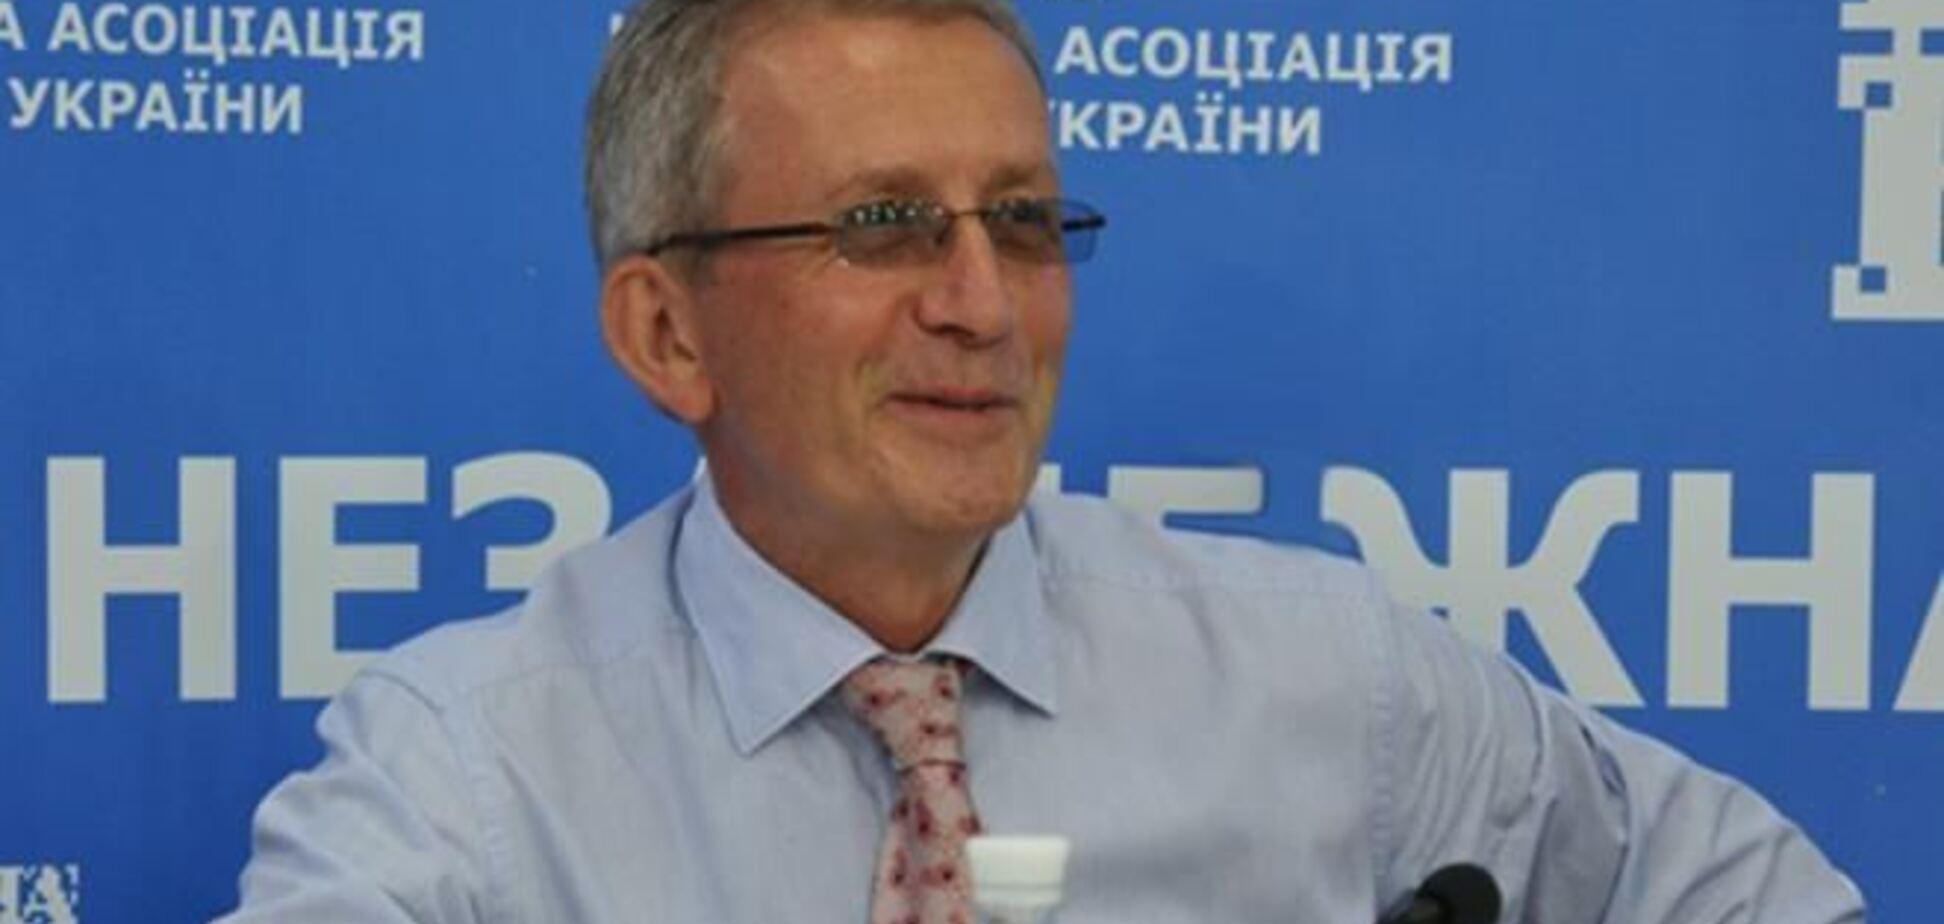 Вывести деньги из Украины Курченко помог его топ-менеджер, банкир Тимонькин